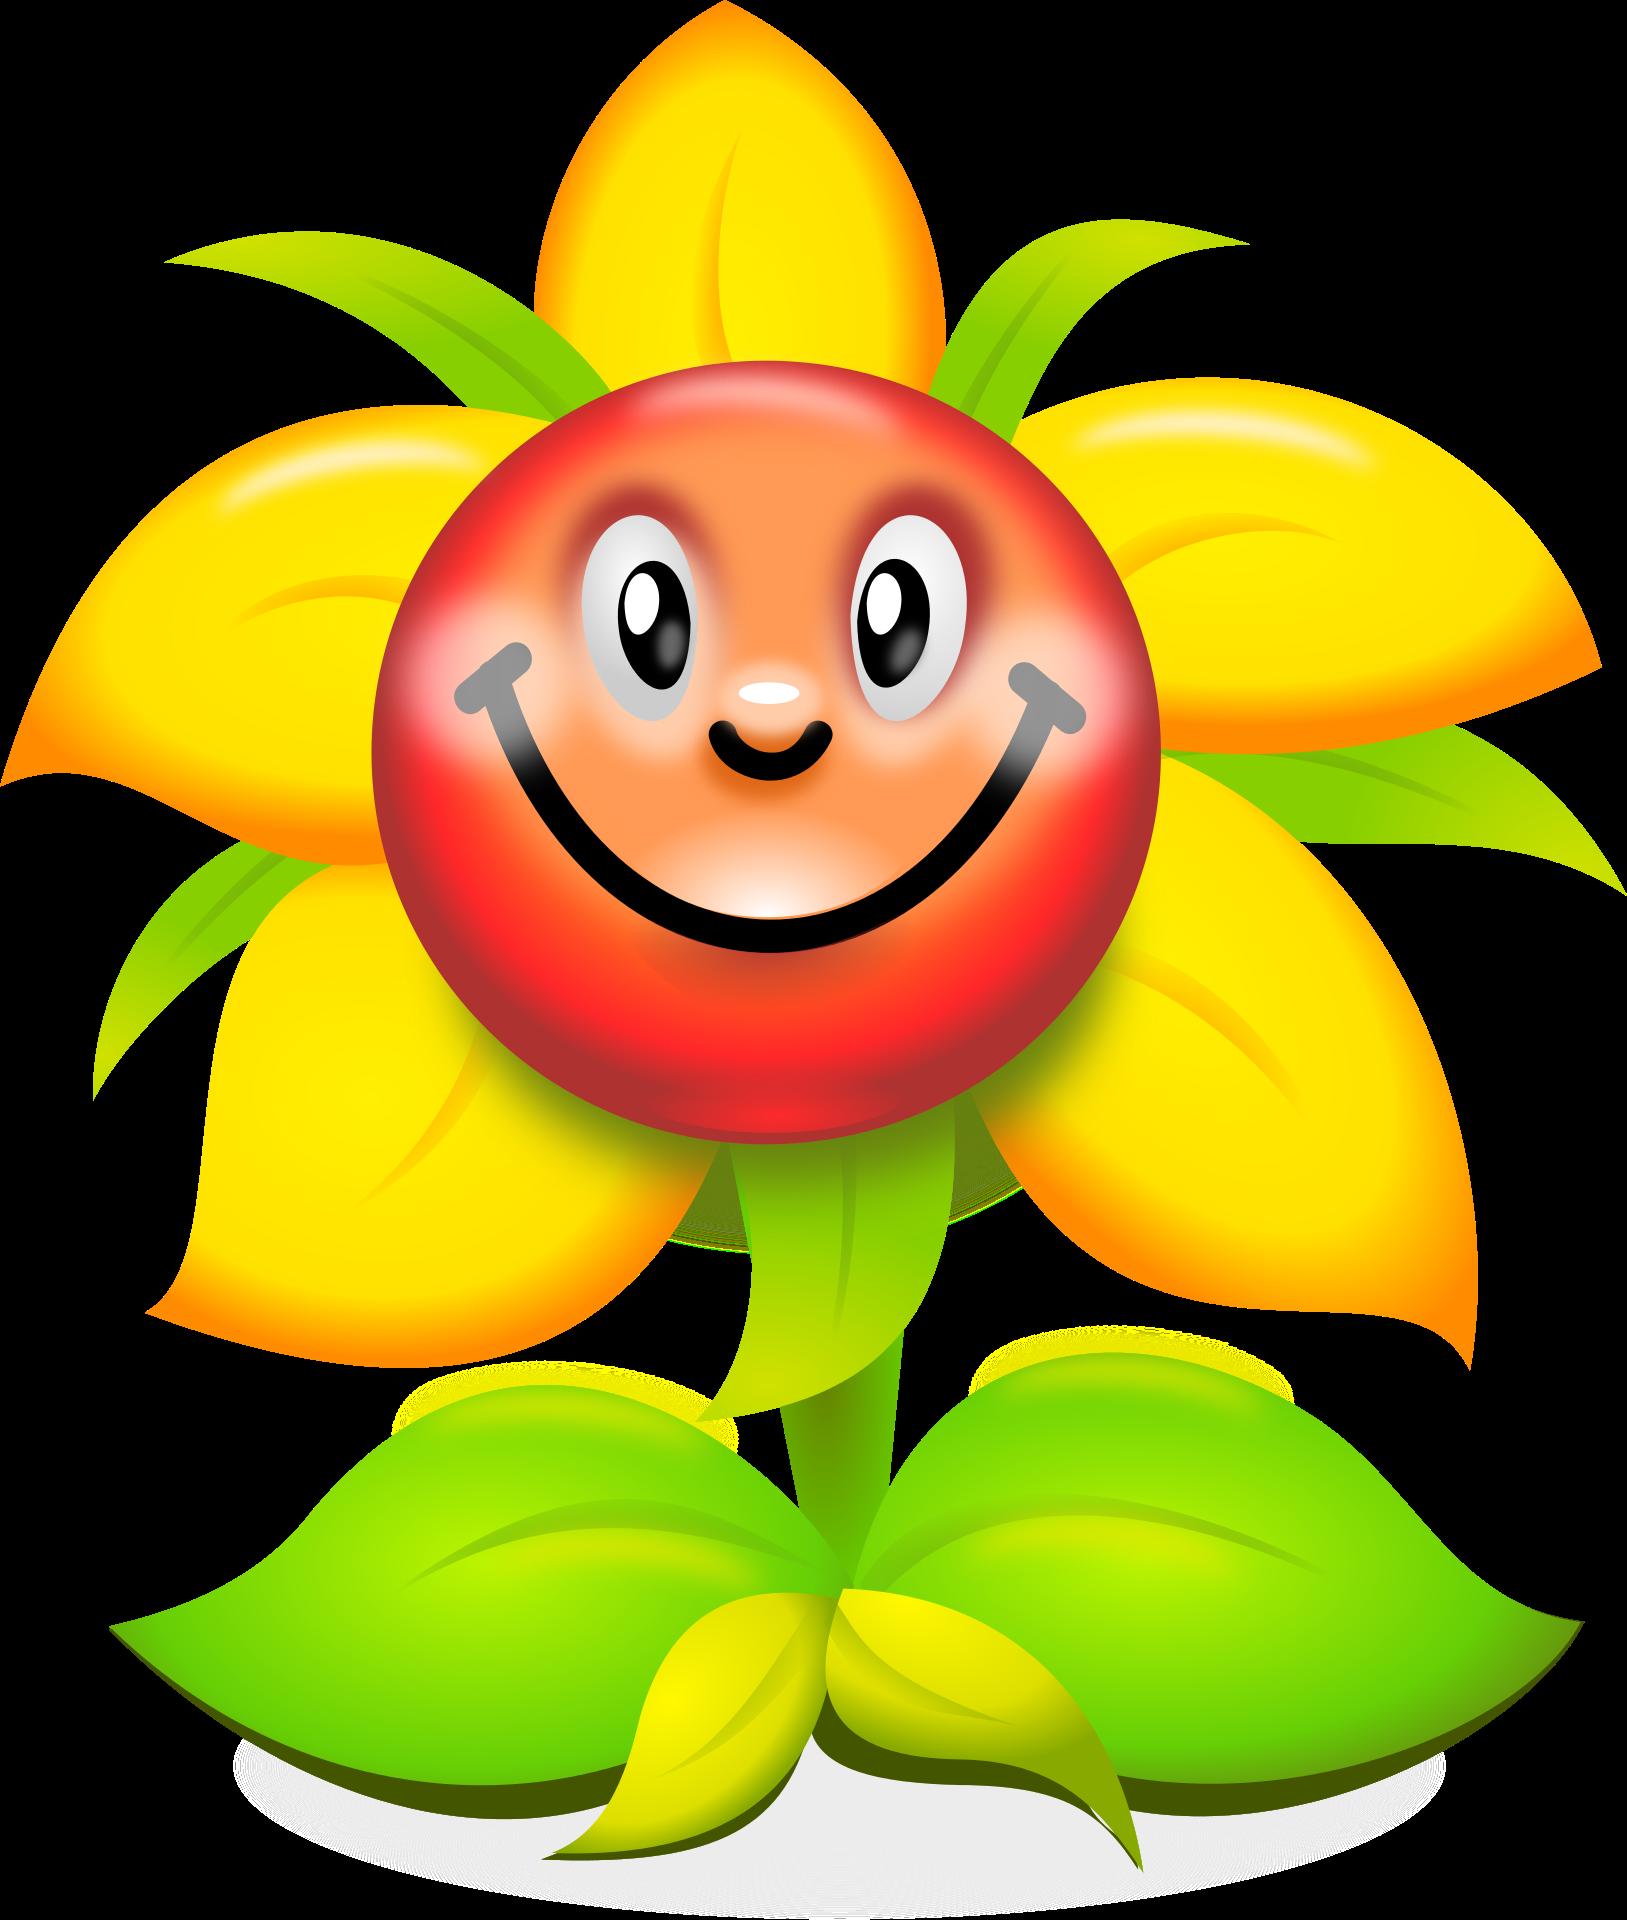 Flower Humour Smiley Clip art - Smiley sunflowers 1627*1920 ... clip art free